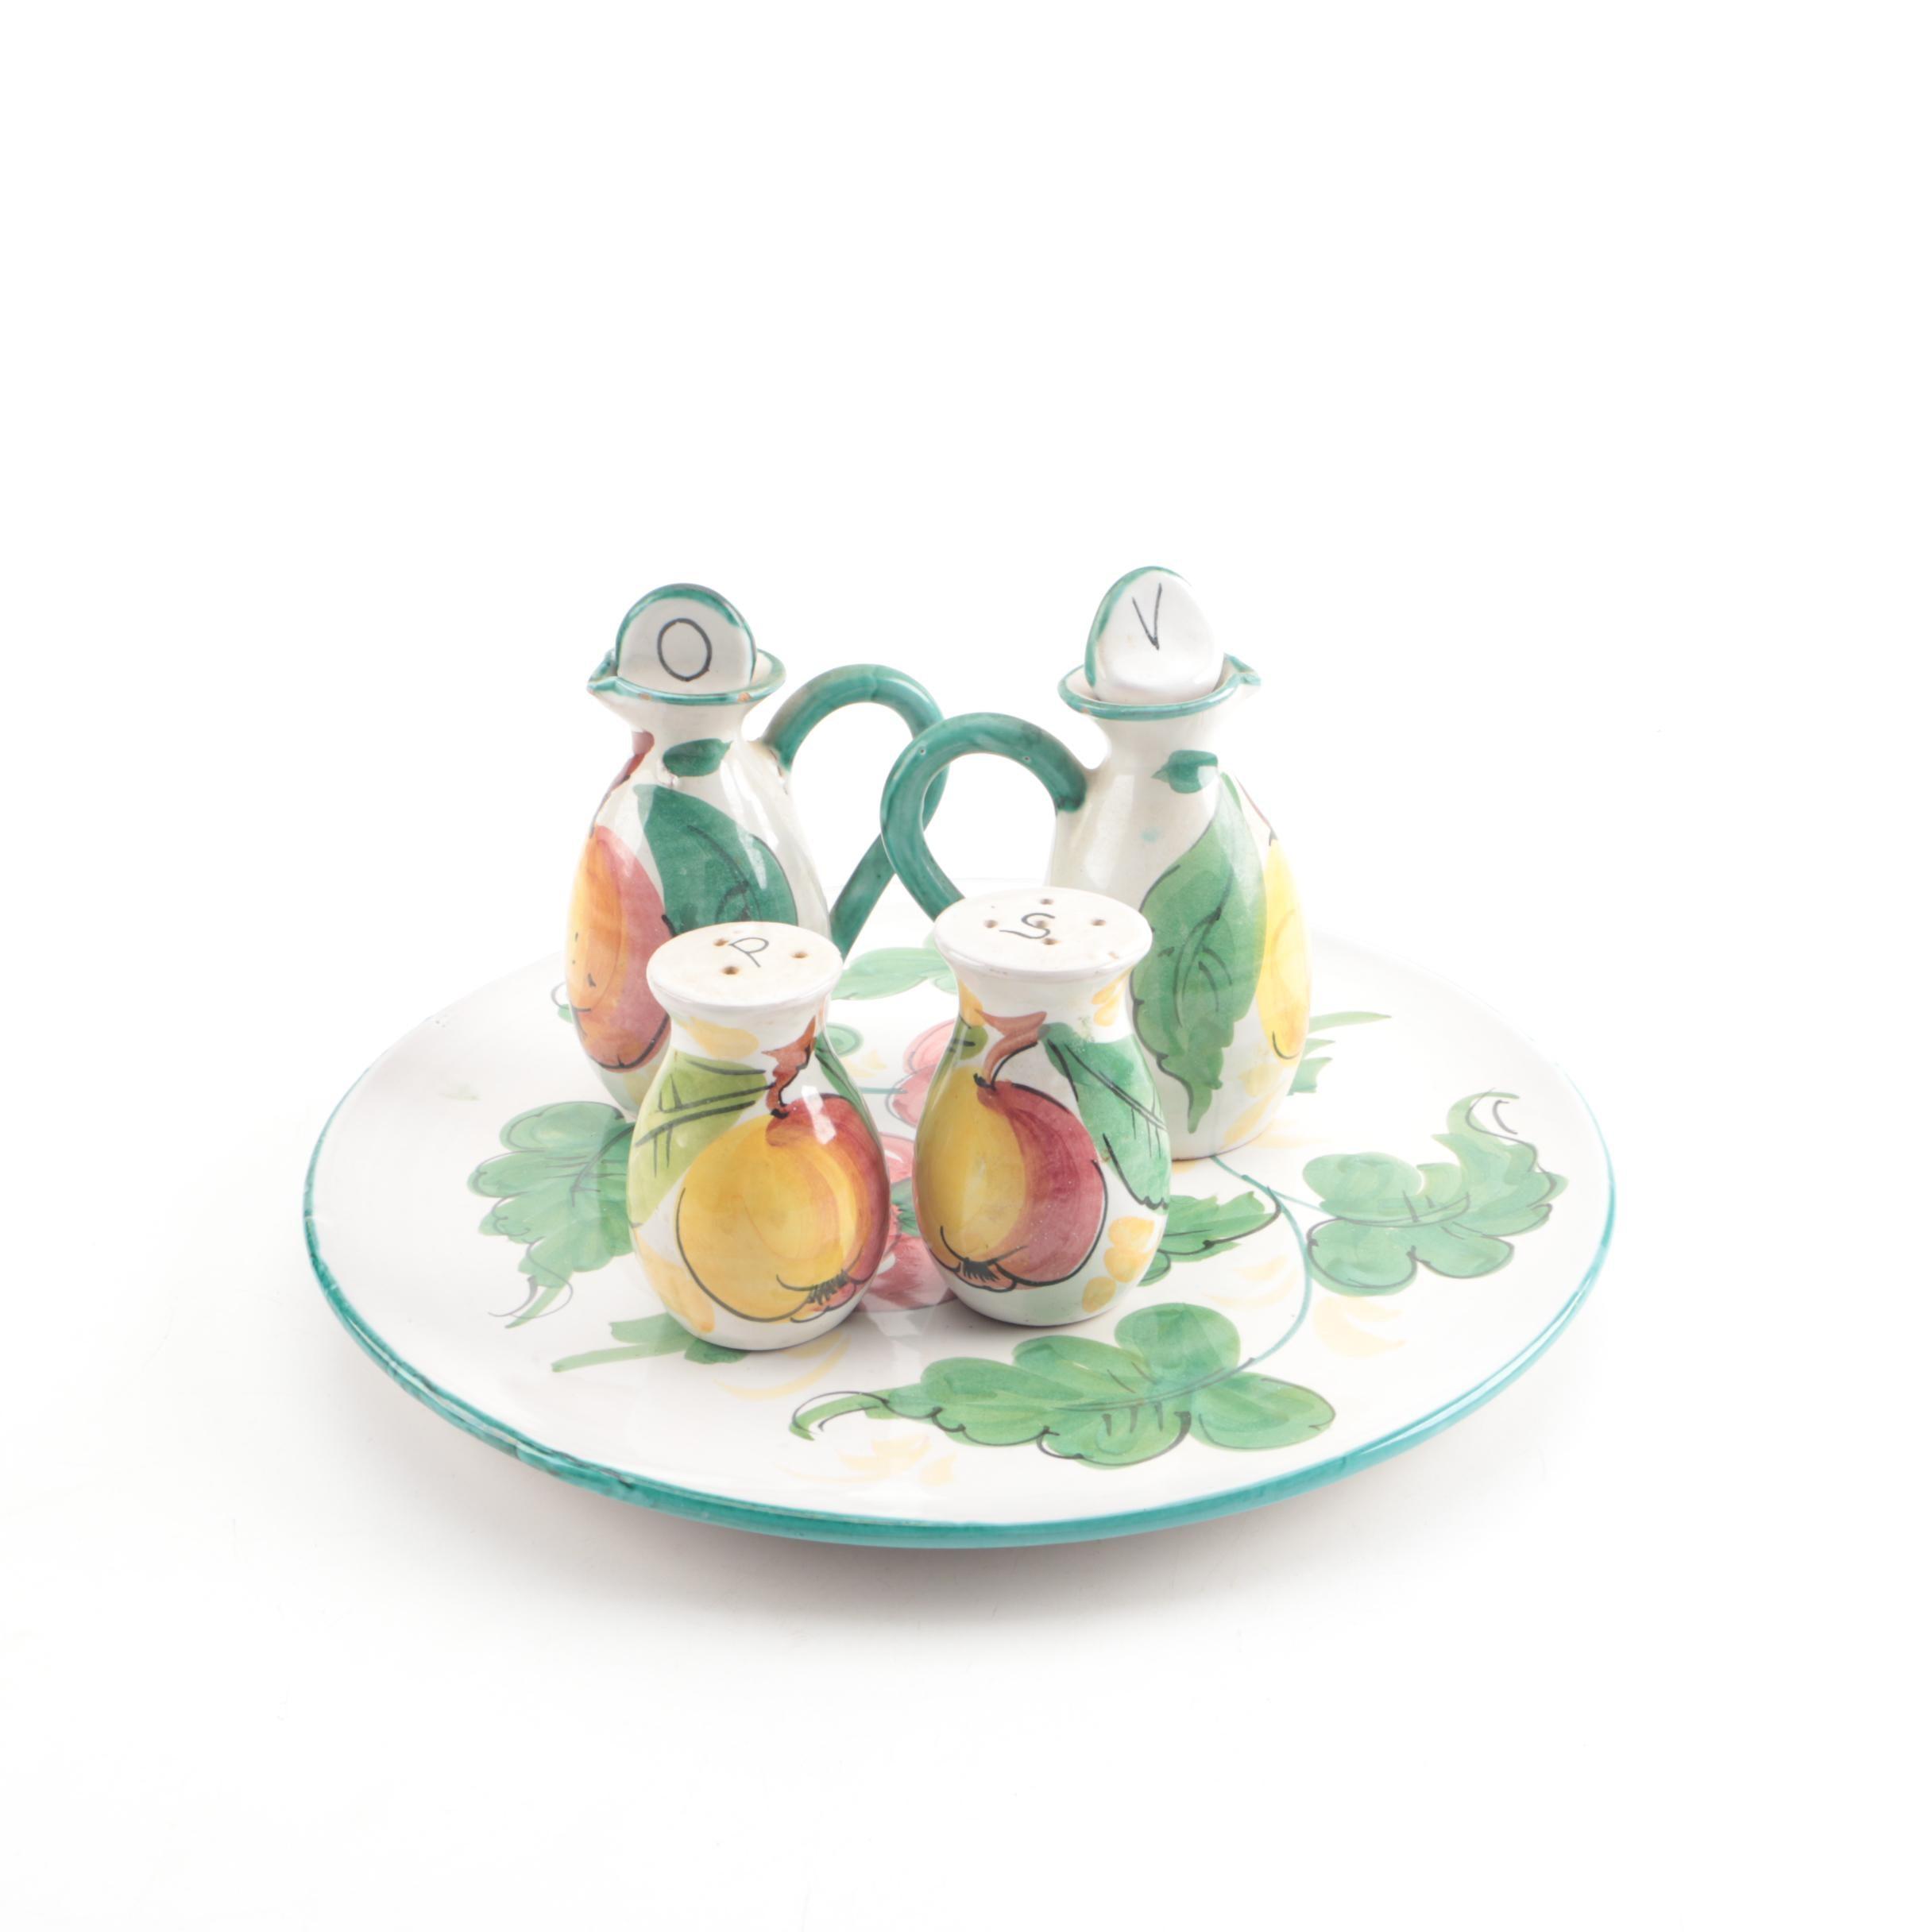 Hand-painted Italian Faience Serveware